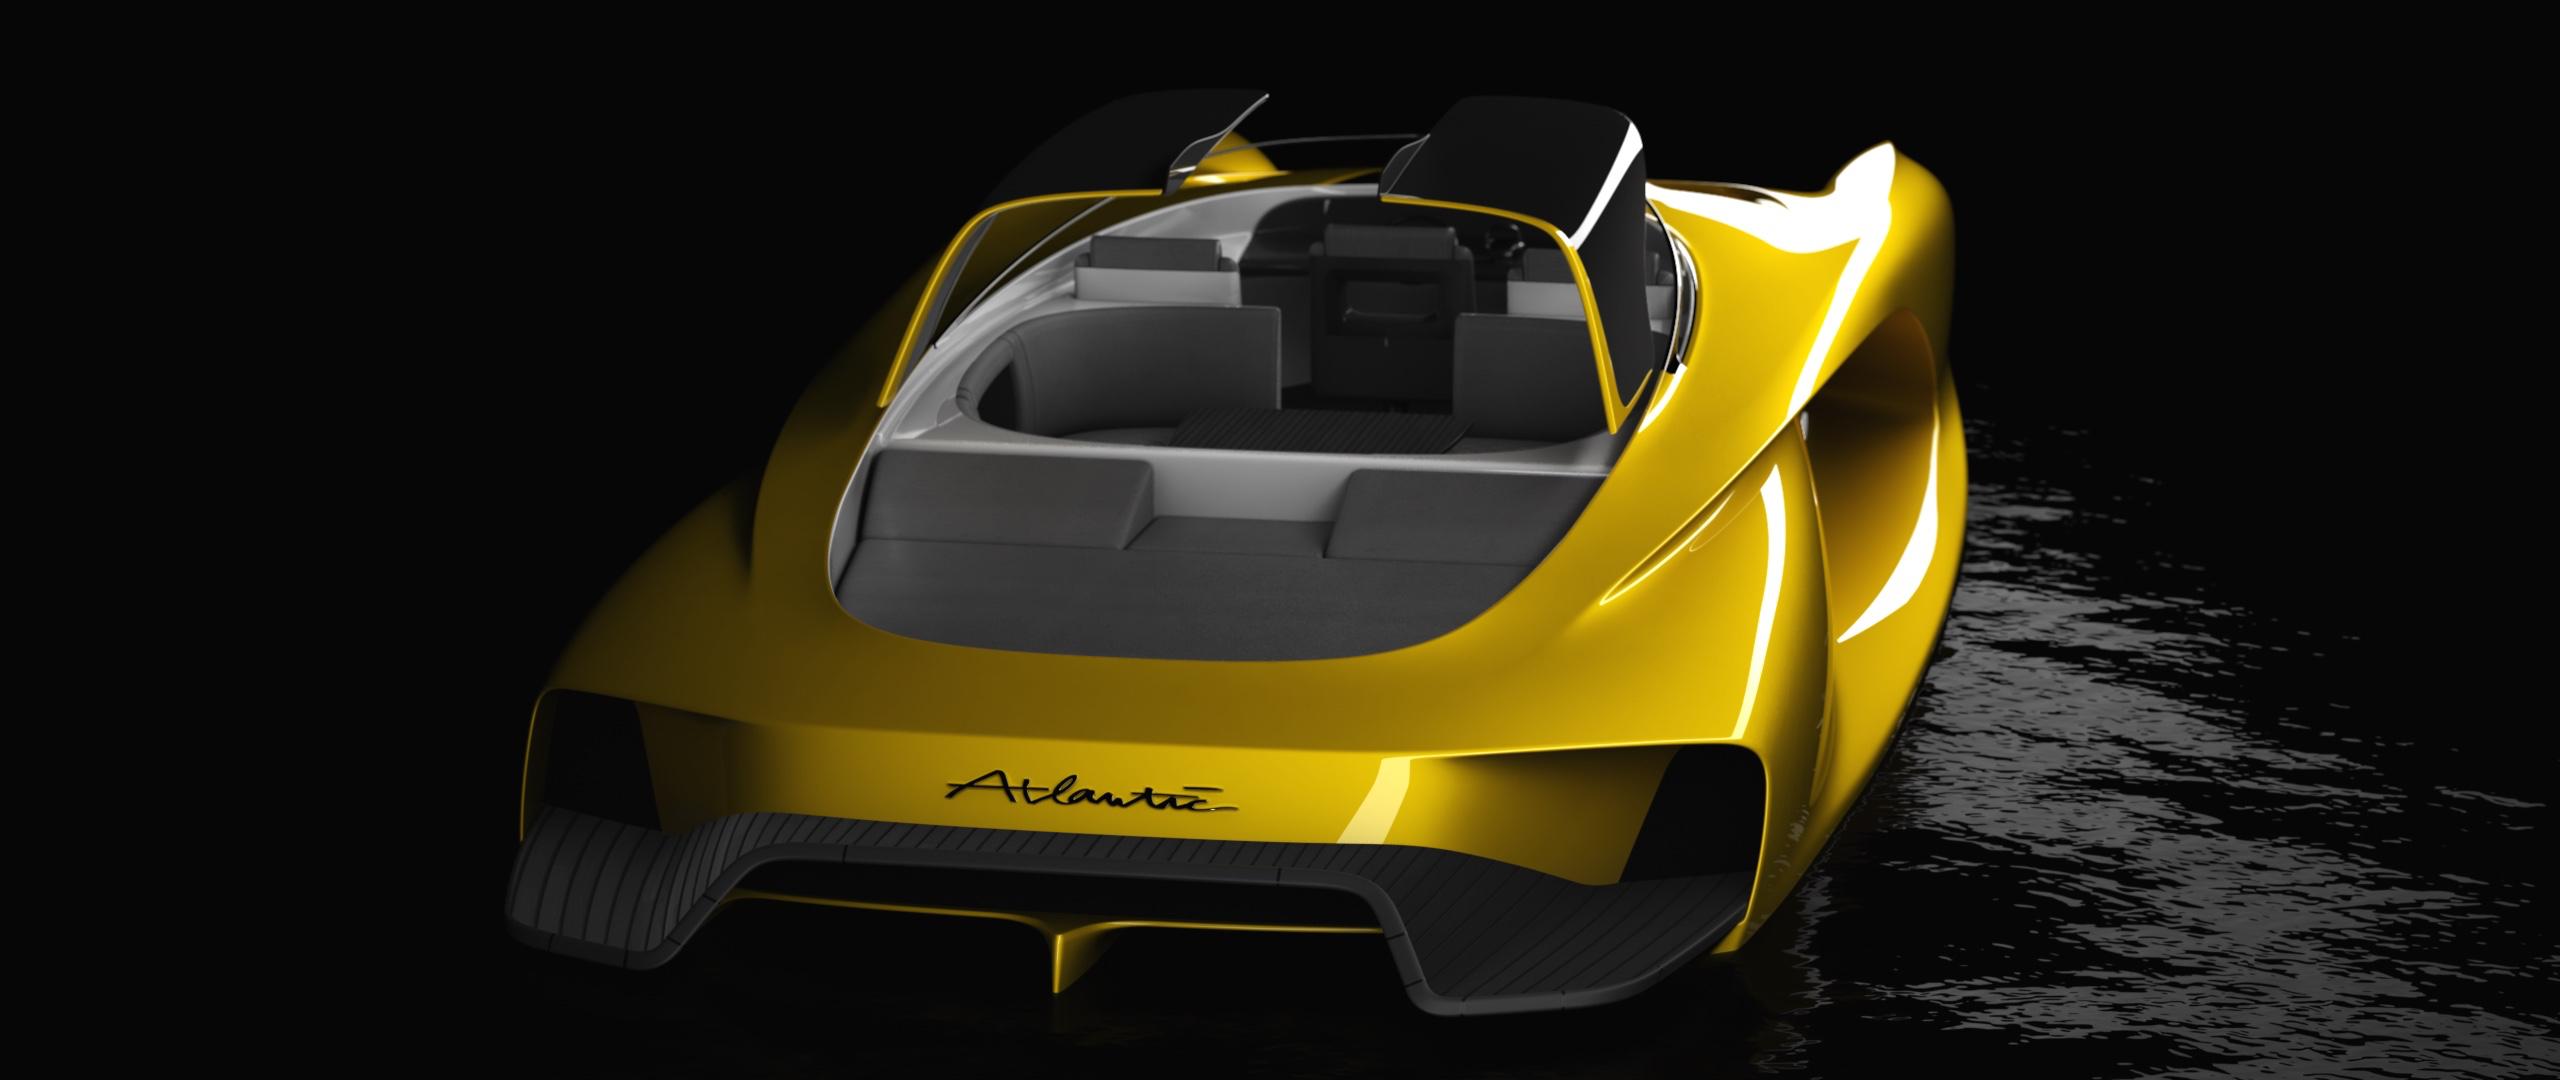 Atlantic sport tender is like an aquatic Bugatti